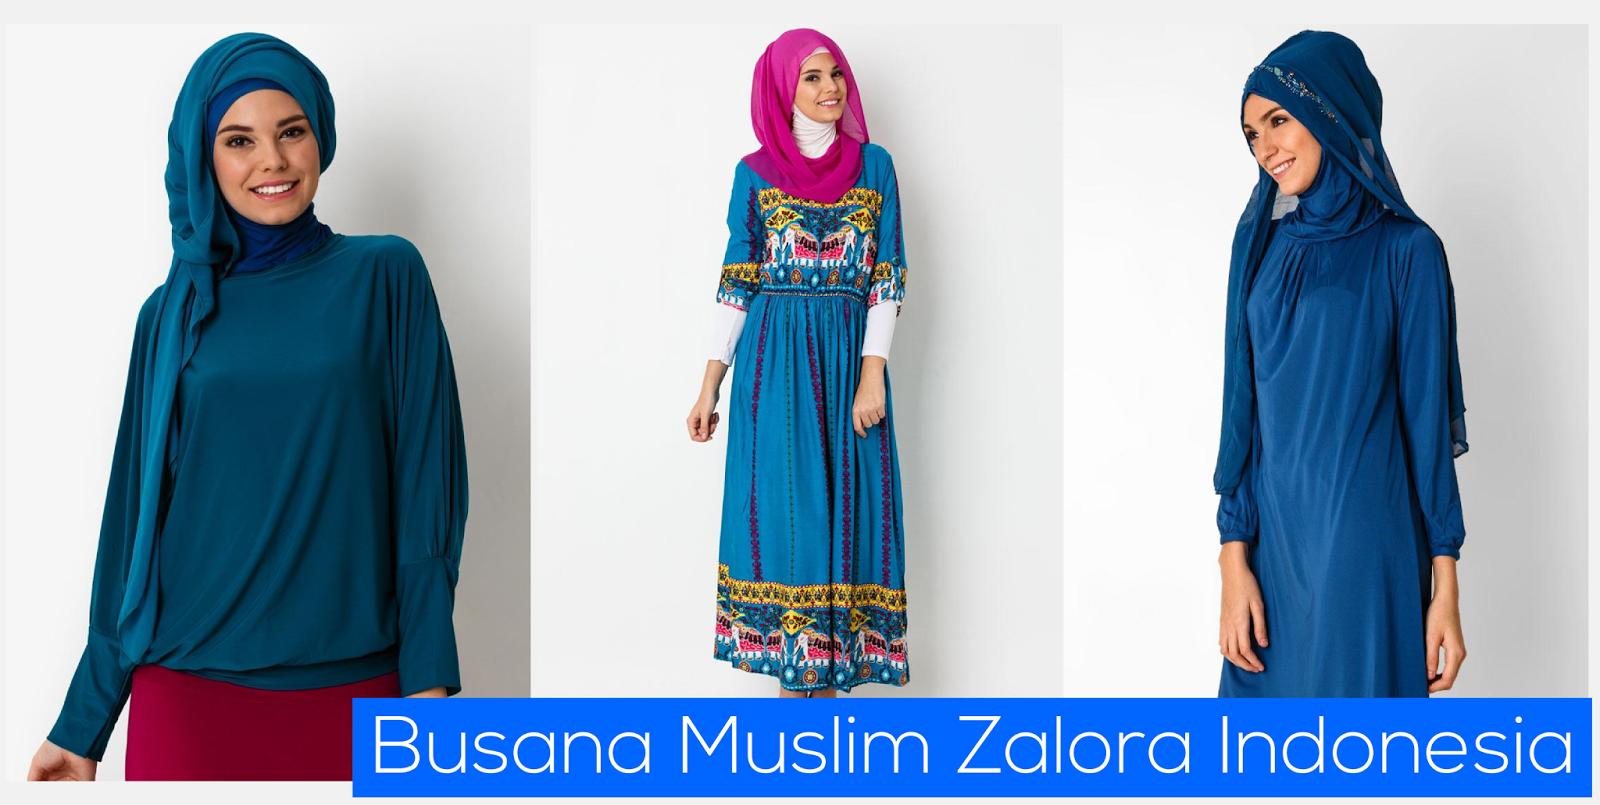 Busana Muslim Zalora Indonesia